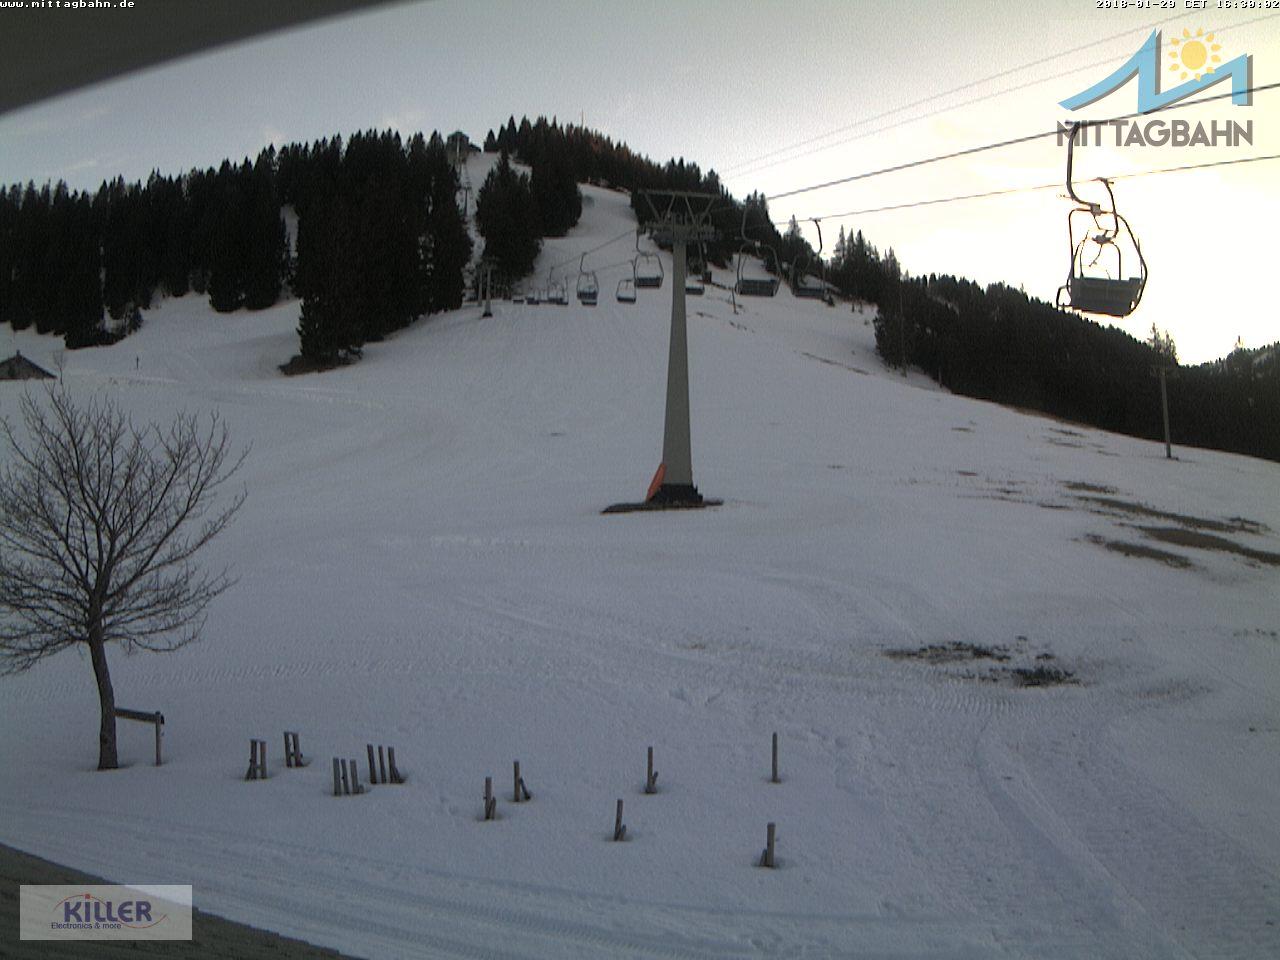 Webcam Ski Resort Immenstadt - Mittag cam 5 - Bavaria Alps - Allg�u